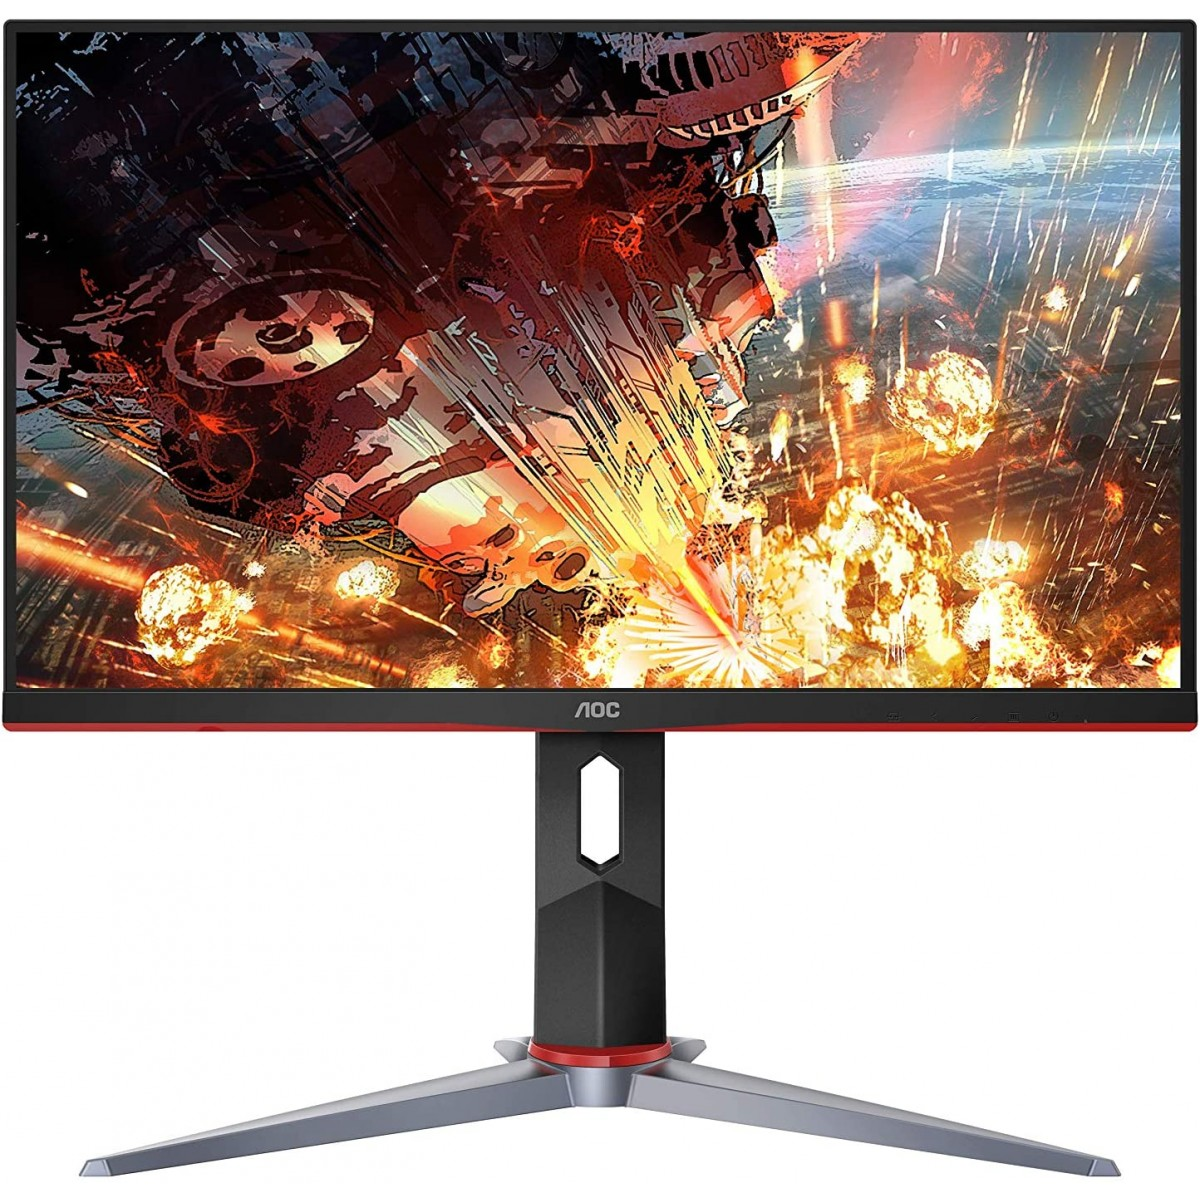 AOC 24G2 24'' 144HZ 1MS 1080P IPS Gaming Monitor